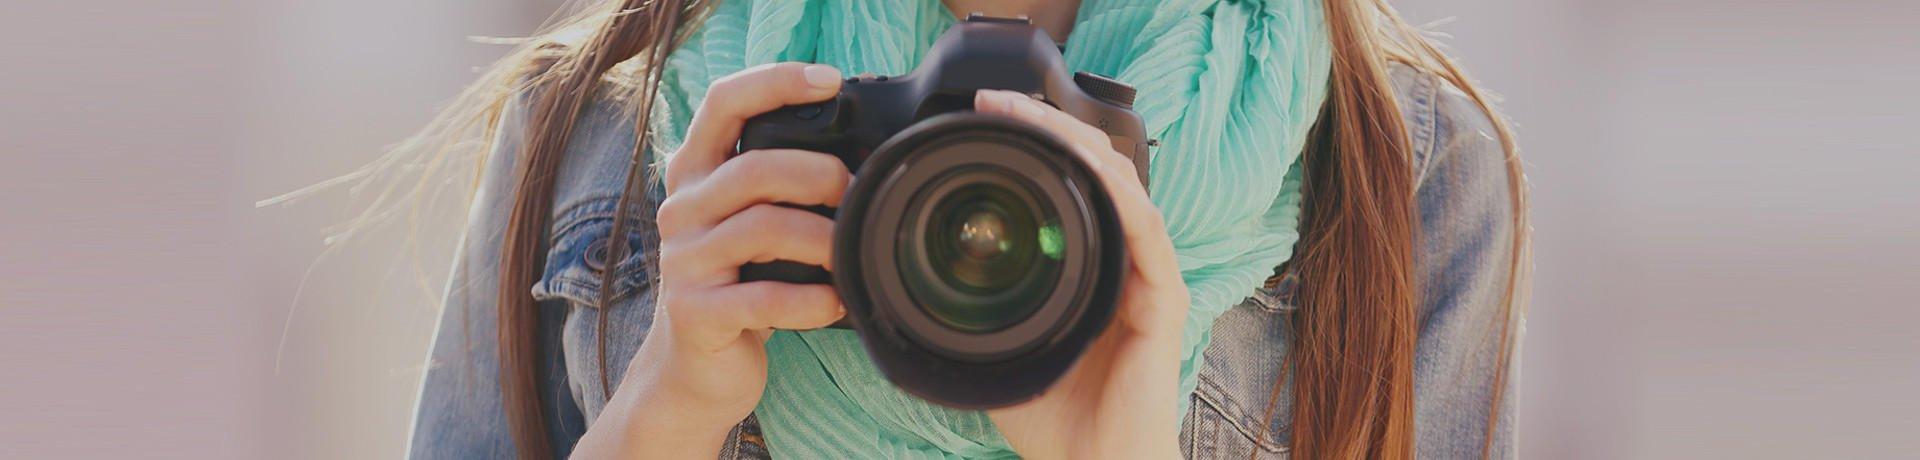 TAKING PICTURES ZANZIBAR